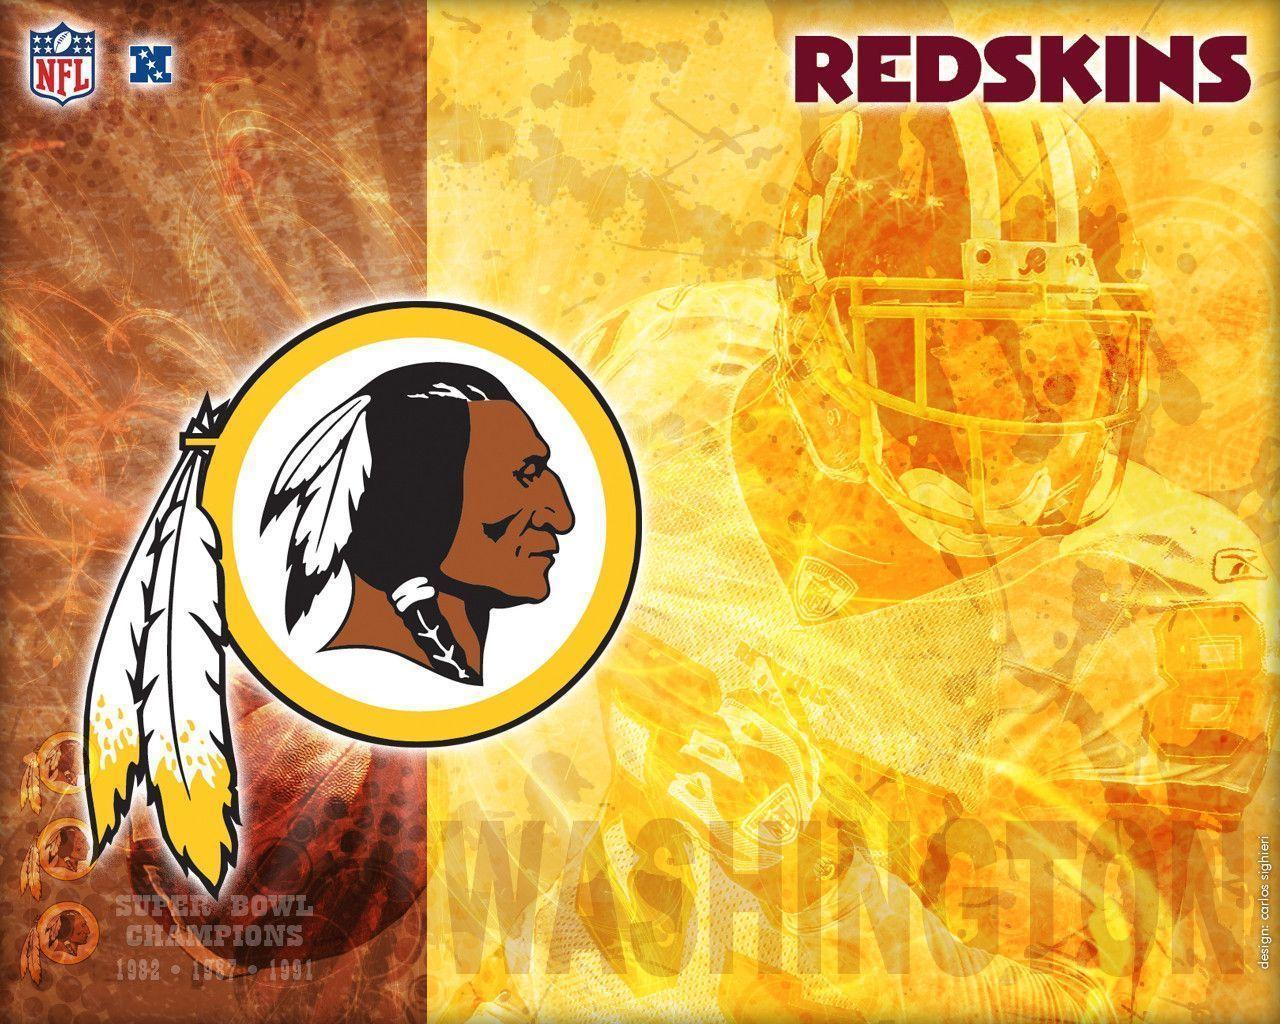 Washington redskins wallpapers wallpaper cave - Redskins wallpaper phone ...